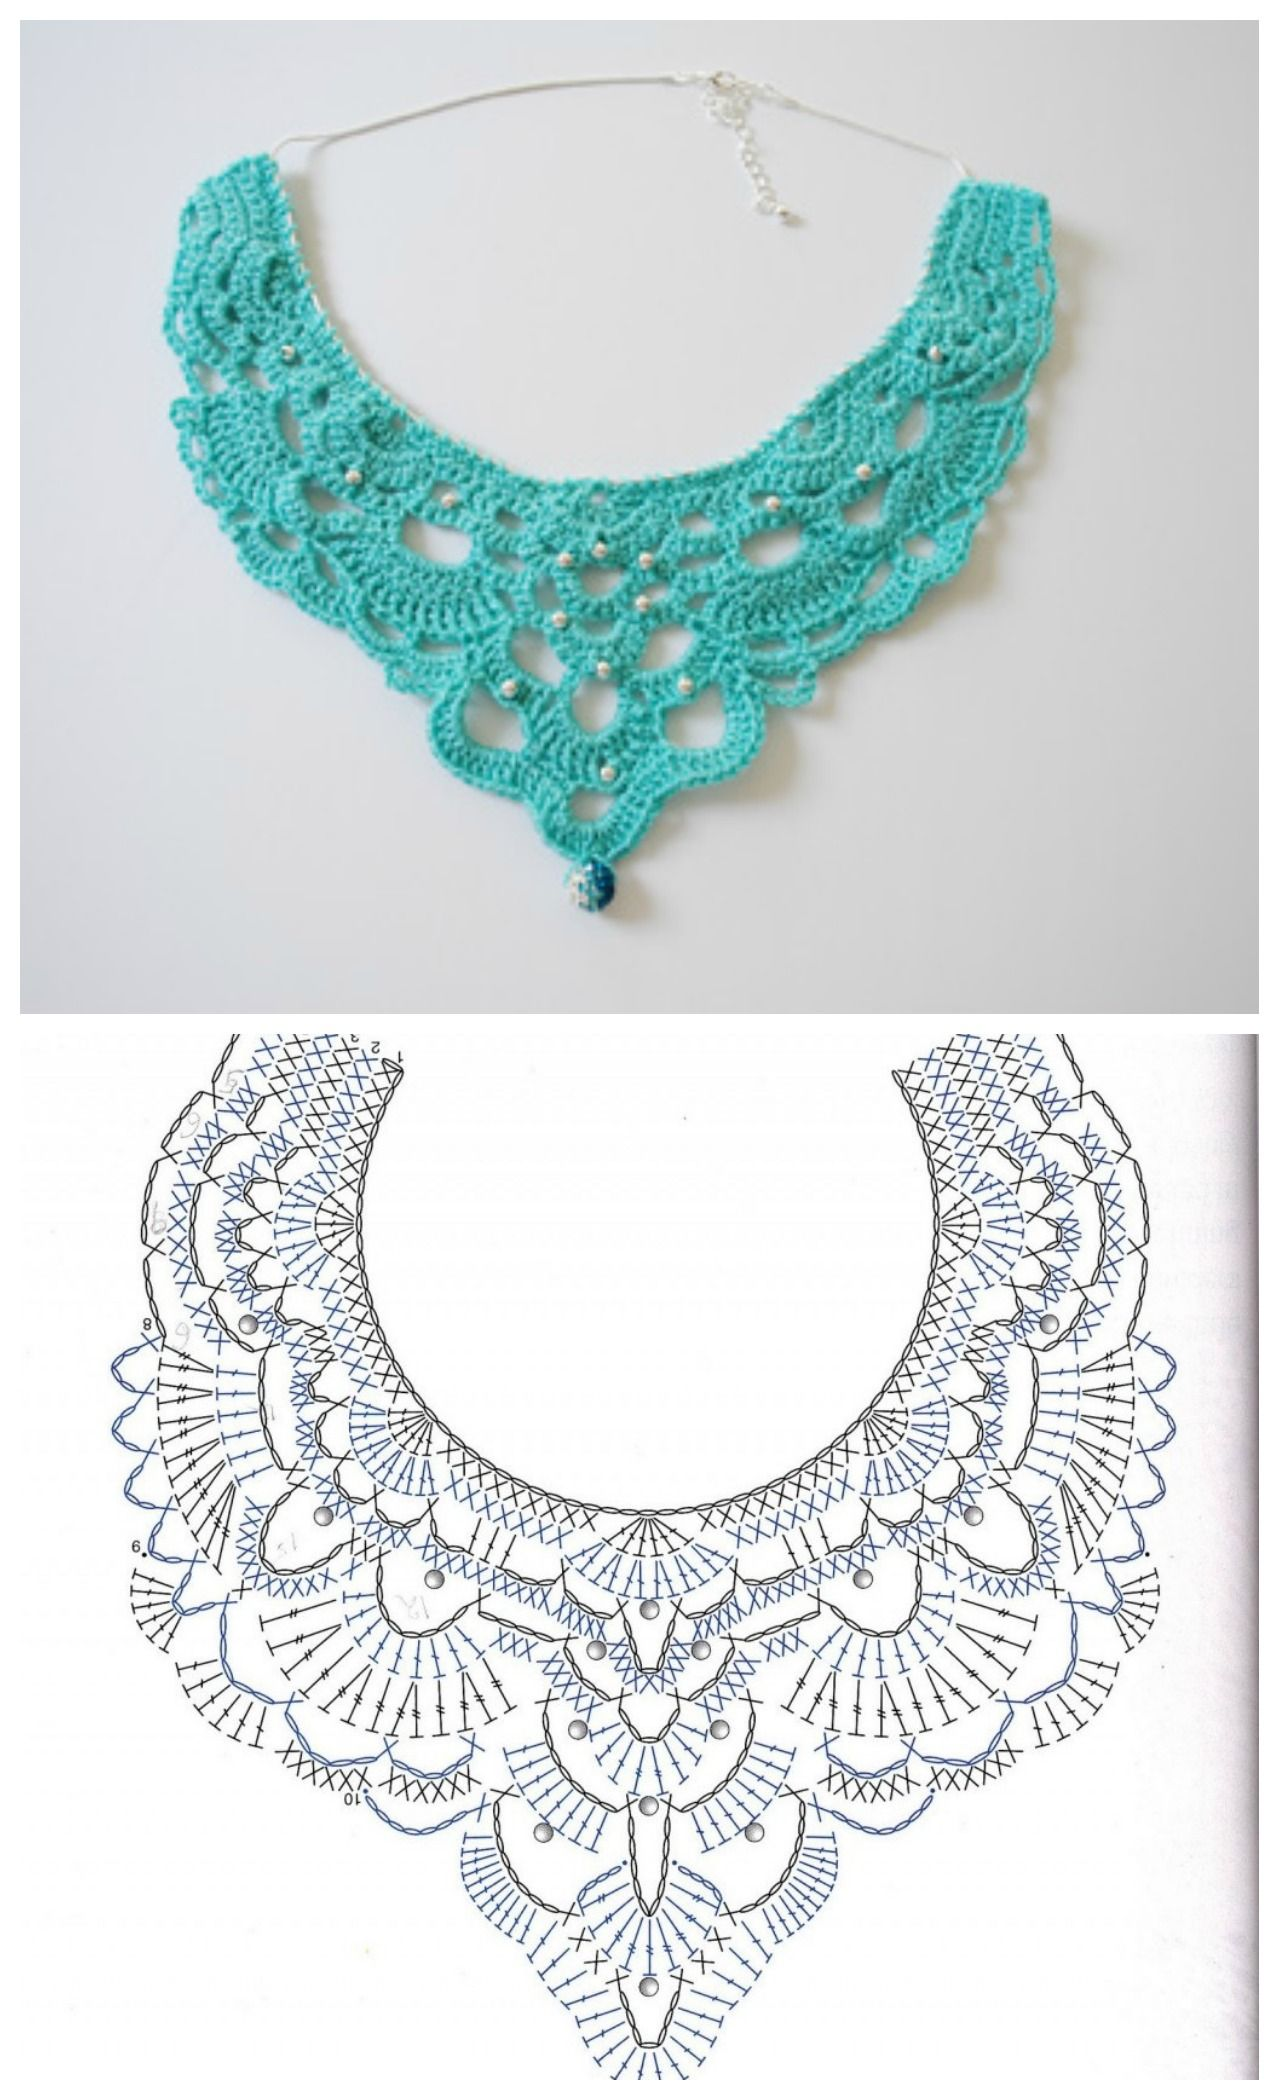 Free crochet chandelier necklace pattern with video tutorial free crochet chandelier necklace pattern with video tutorial from bhooked by britanny featured in aloadofball Gallery